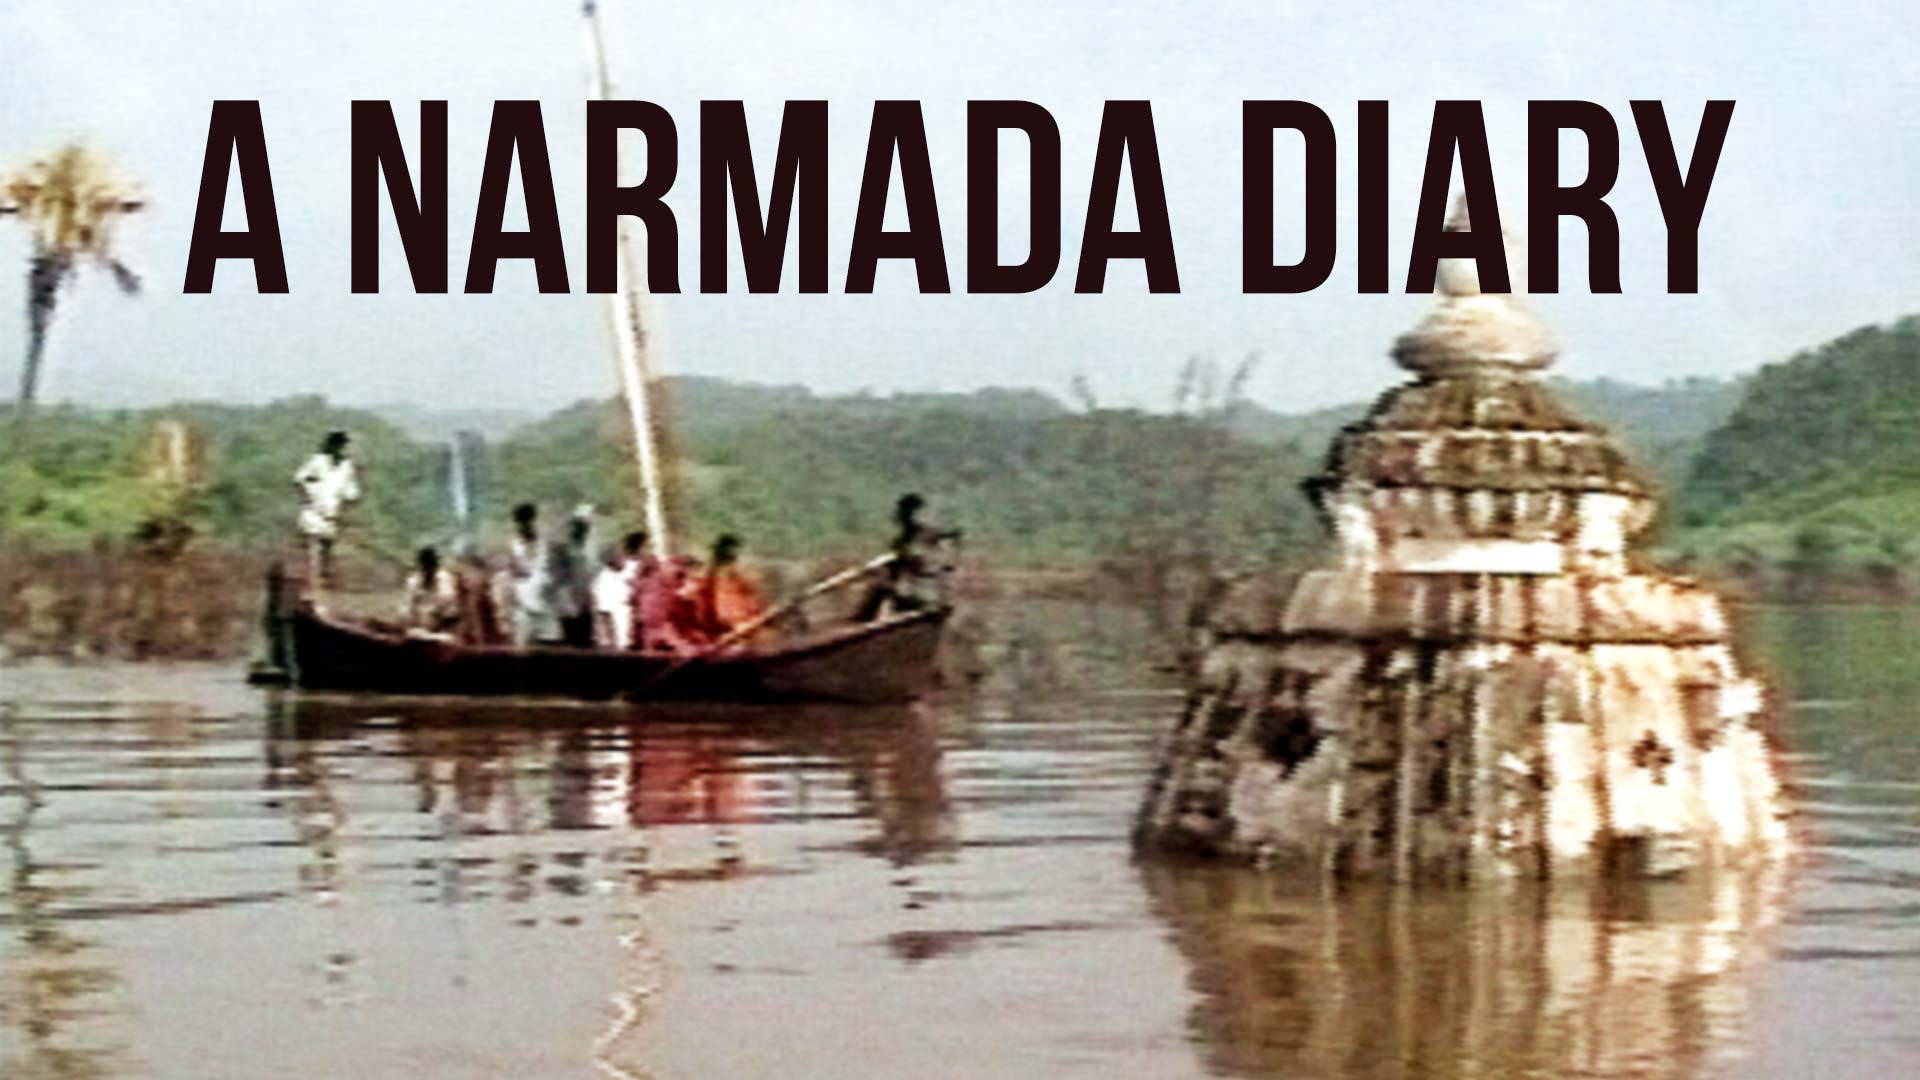 A Narmada Diary - image